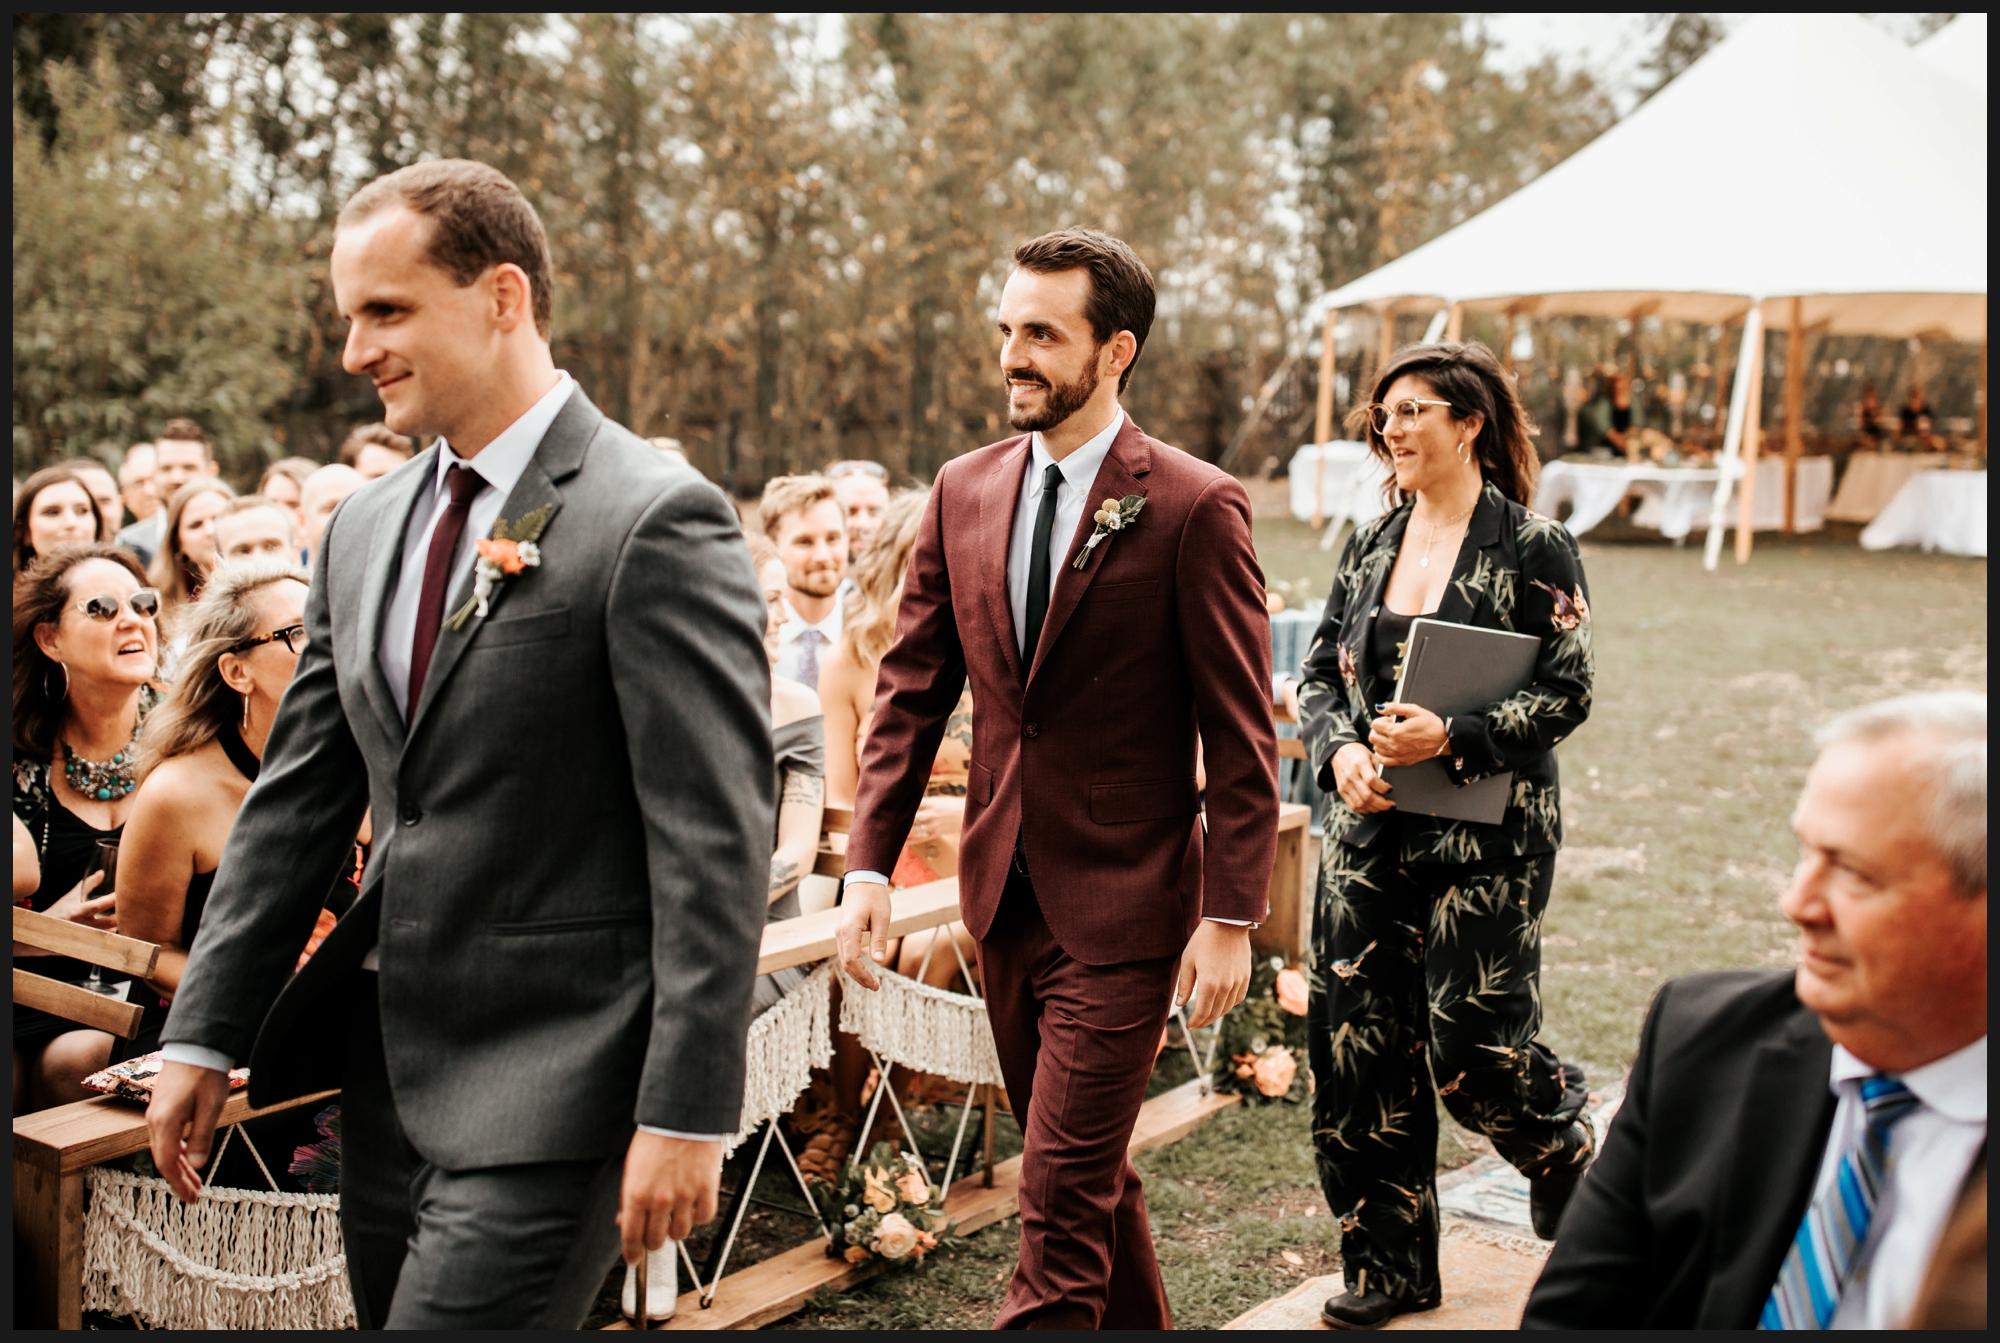 Orlando-Wedding-Photographer-destination-wedding-photographer-florida-wedding-photographer-bohemian-wedding-photographer_2000.jpg